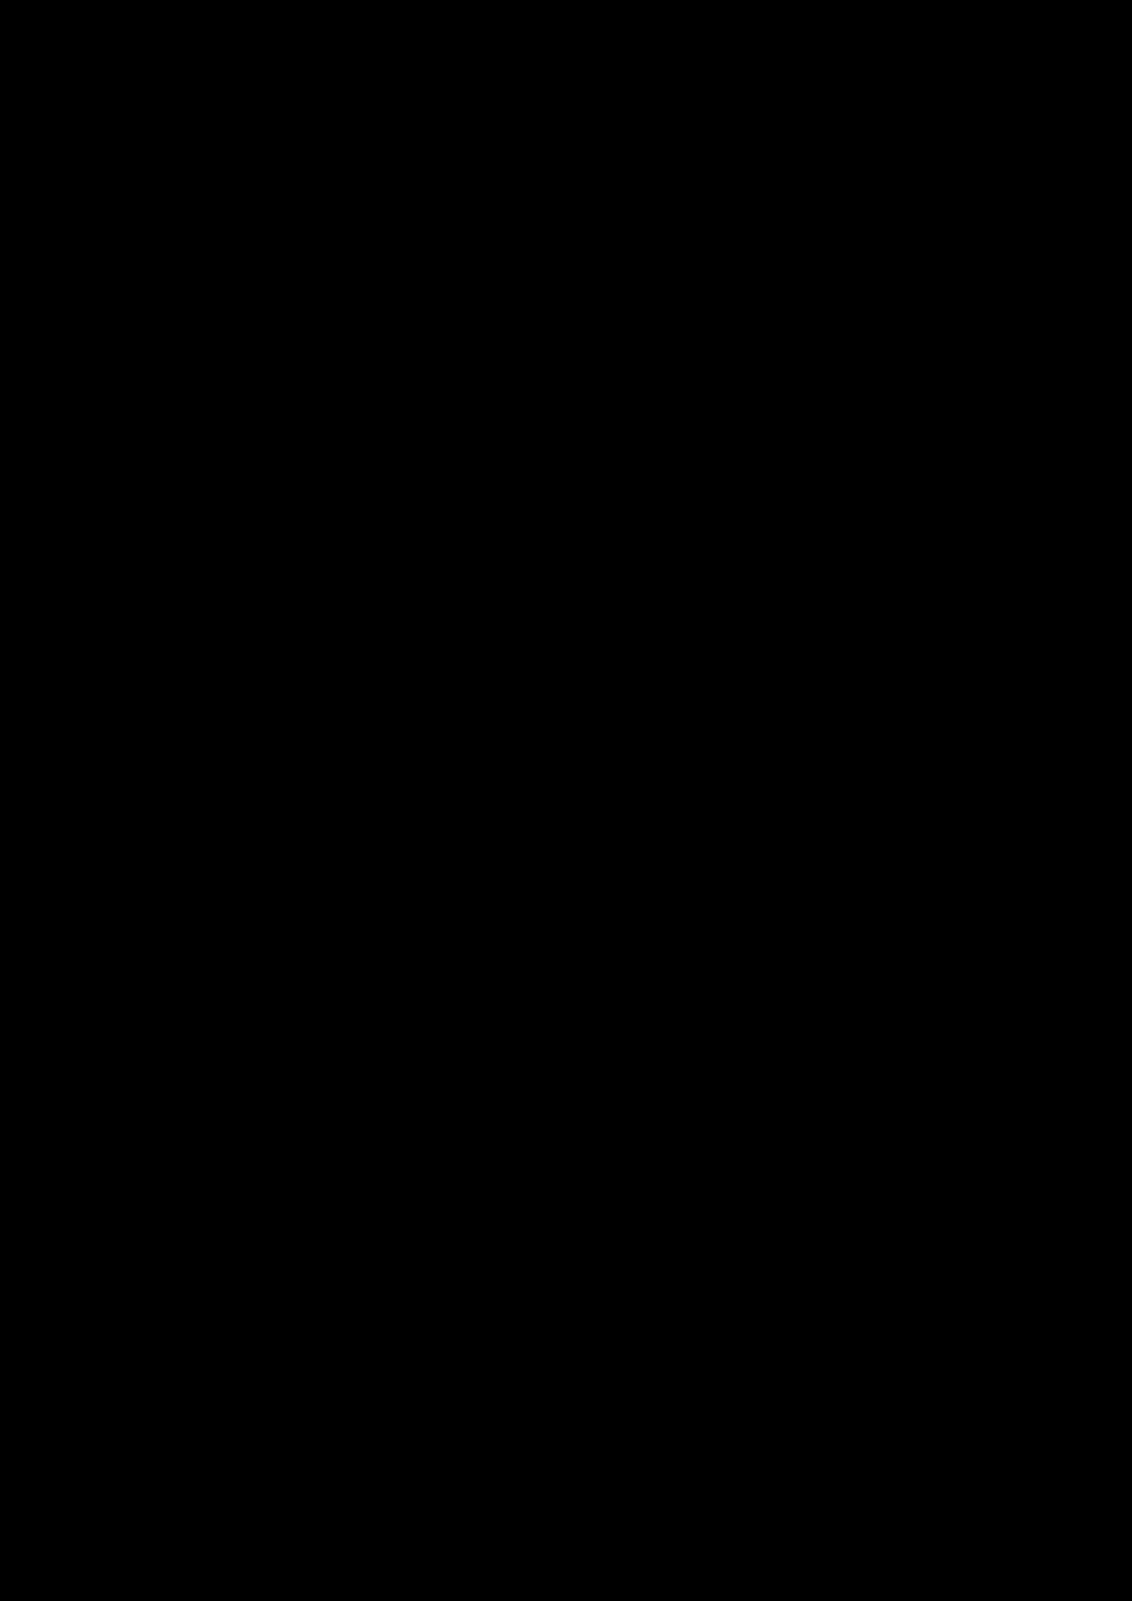 Belyiy sokol slide, Image 61